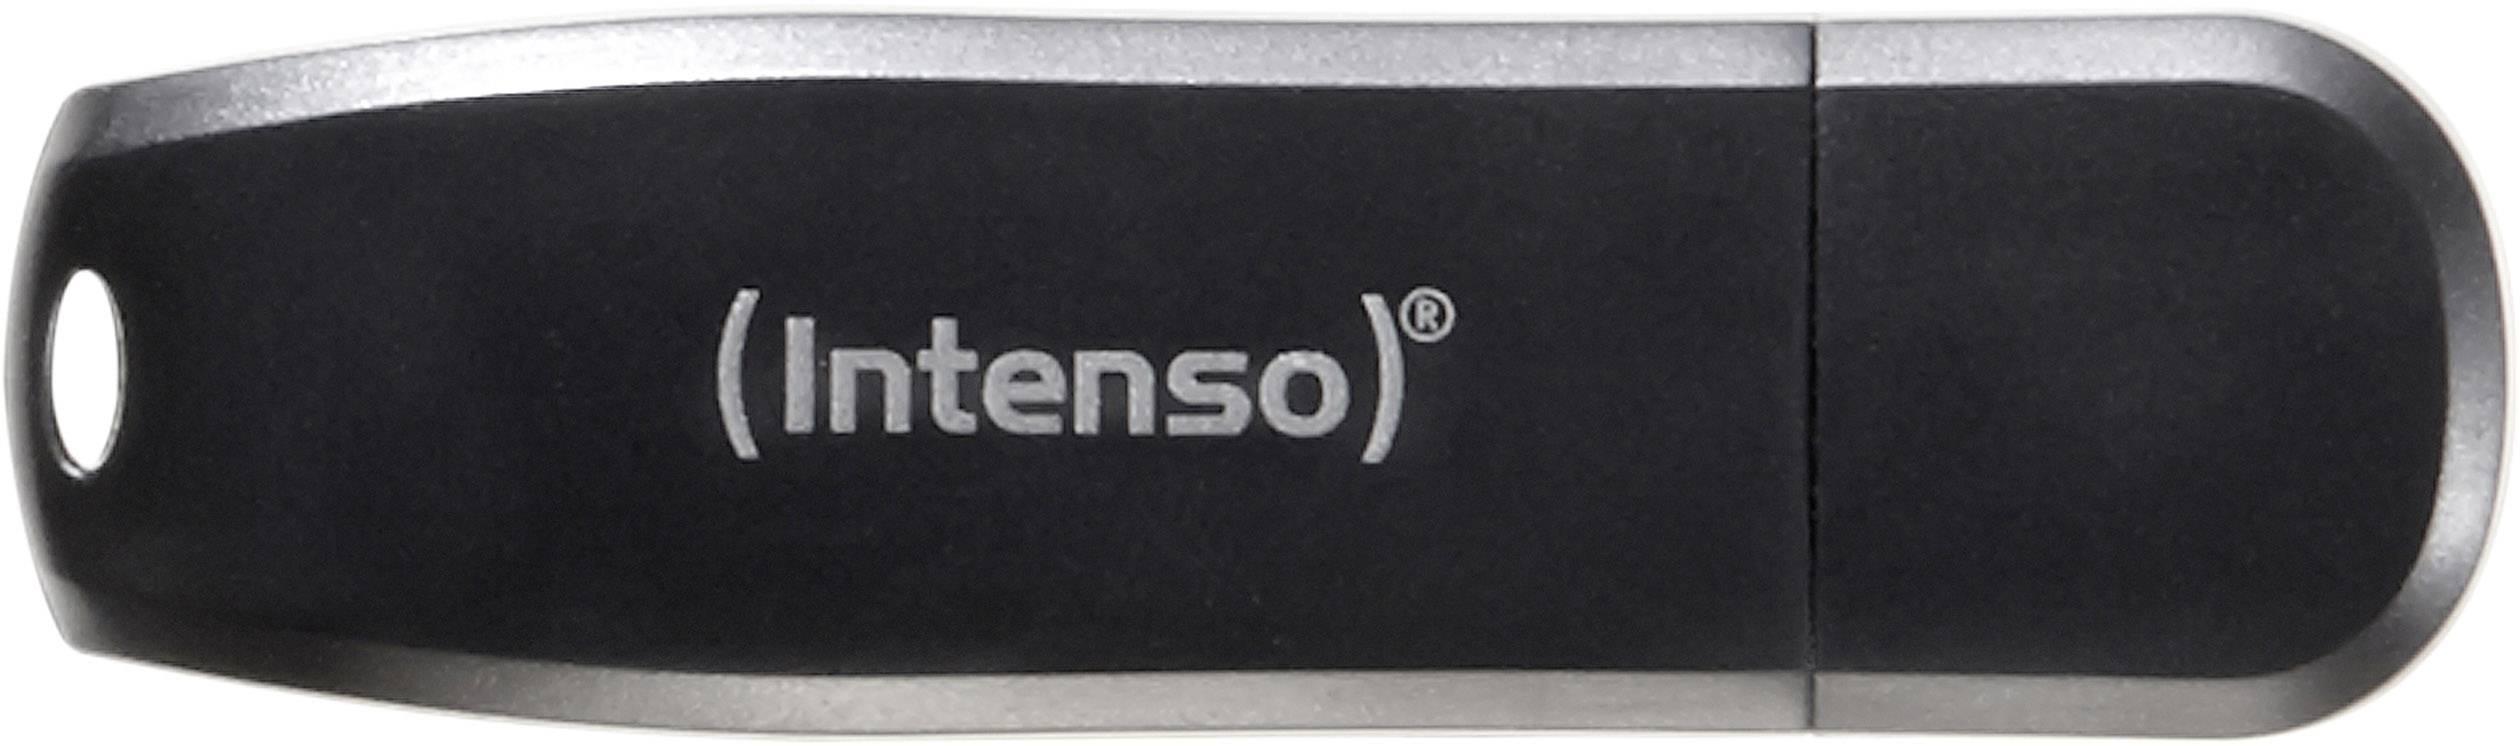 USB flash disk Intenso Speed Line 3533470, 16 GB, USB 3.0, černá